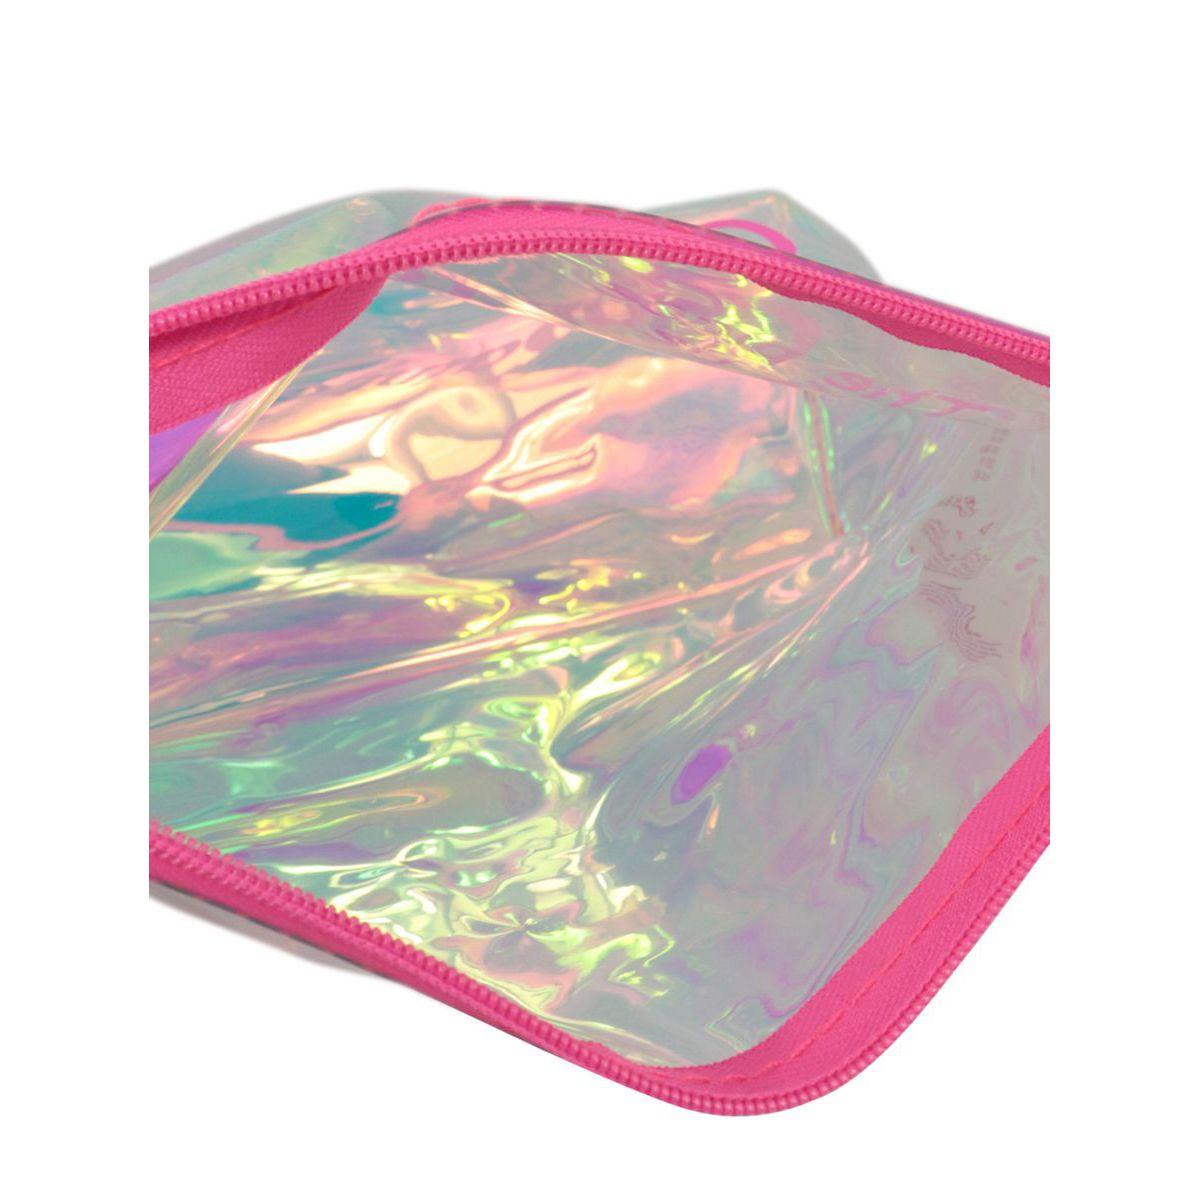 Aline clutch bag in PVC with logo print Pink MC2 Saint Barth